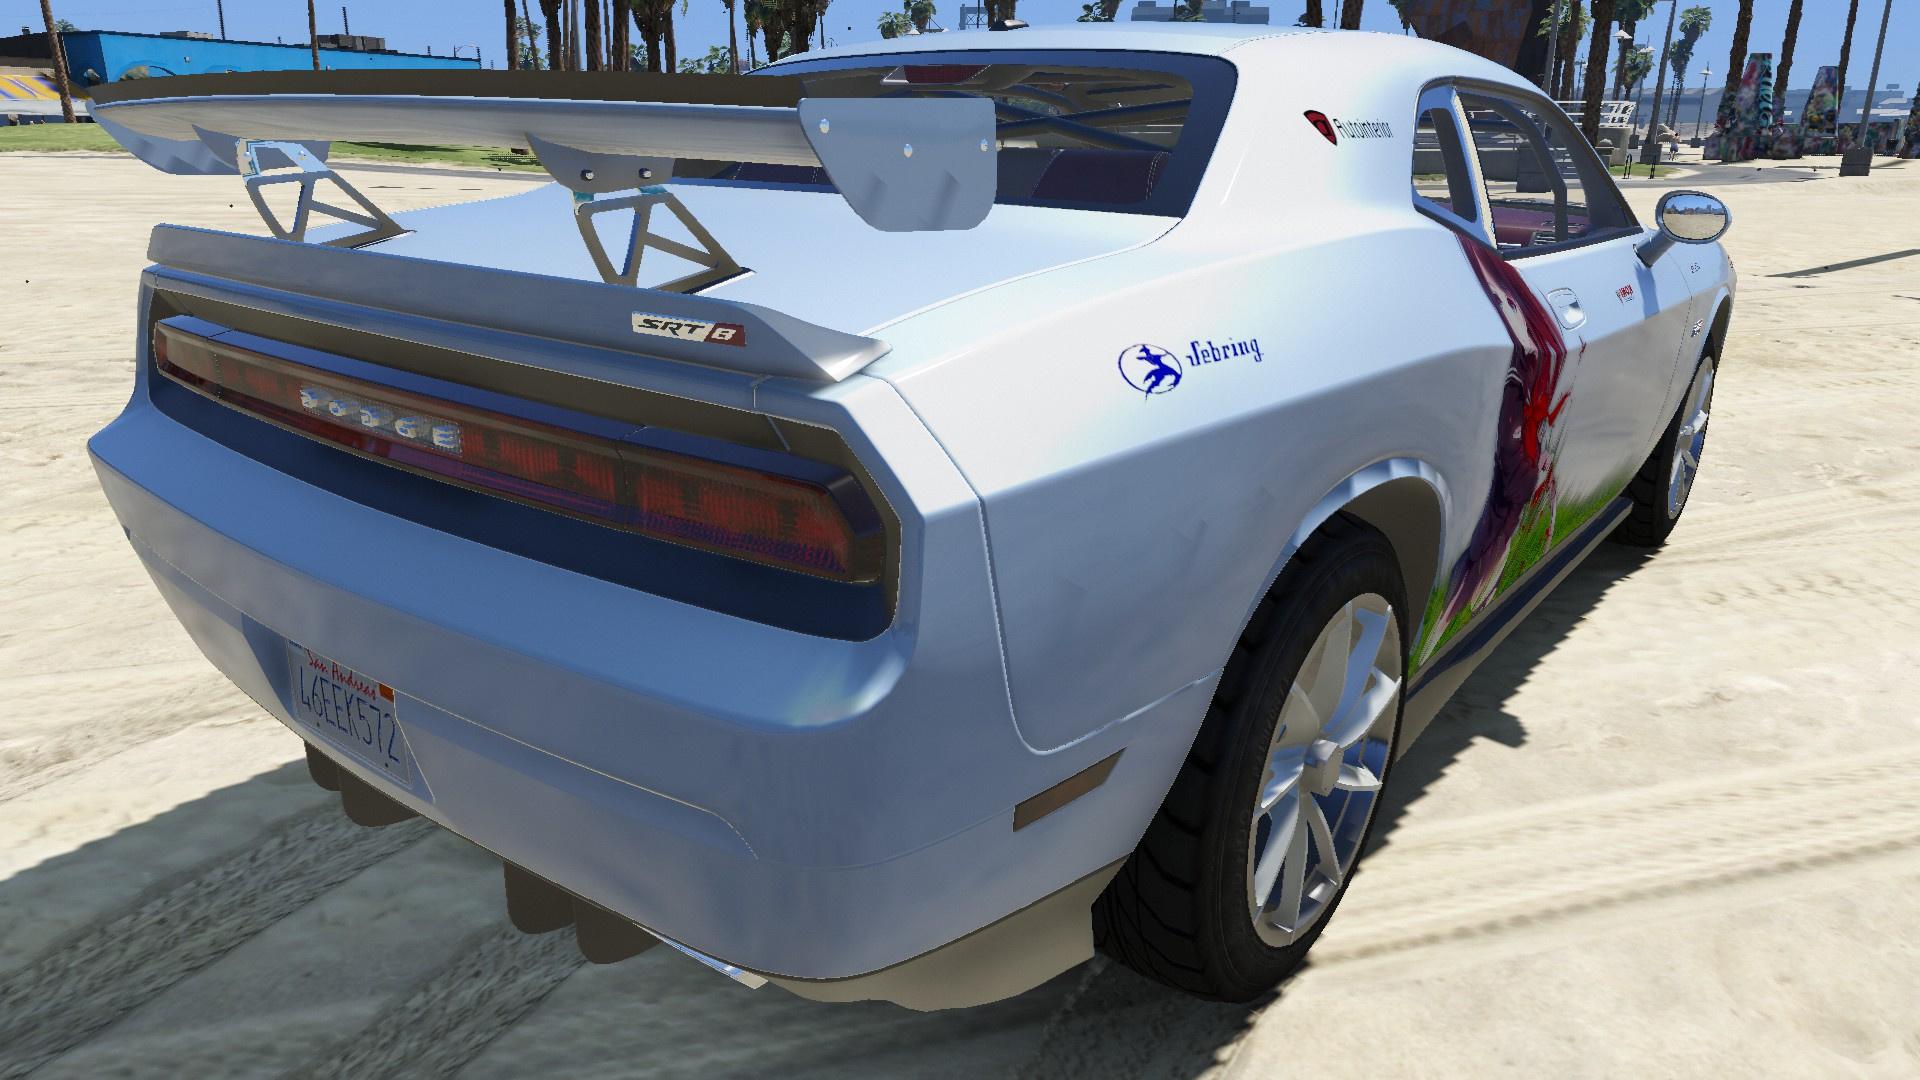 495acf 20160717224755 1 - 2012 Dodge Challenger Srt8 392